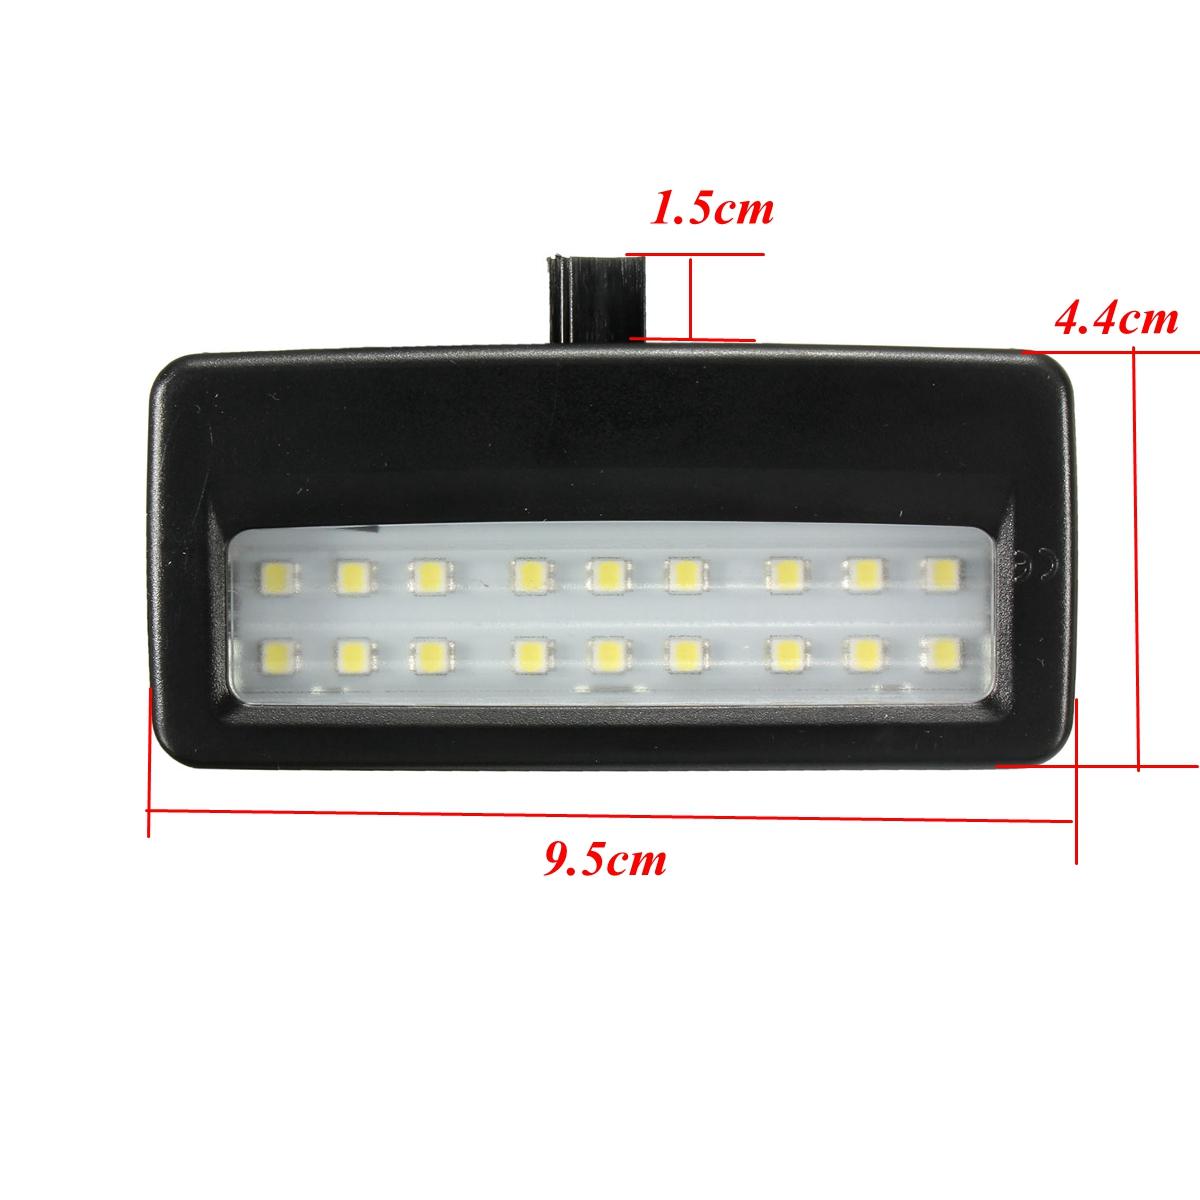 Vanity Light Upgrade : BMW 5 SERIES F10 LED SUN VISOR VANITY MIRROR LIGHT UPGRADE INTERIOR BULB LAMPS eBay